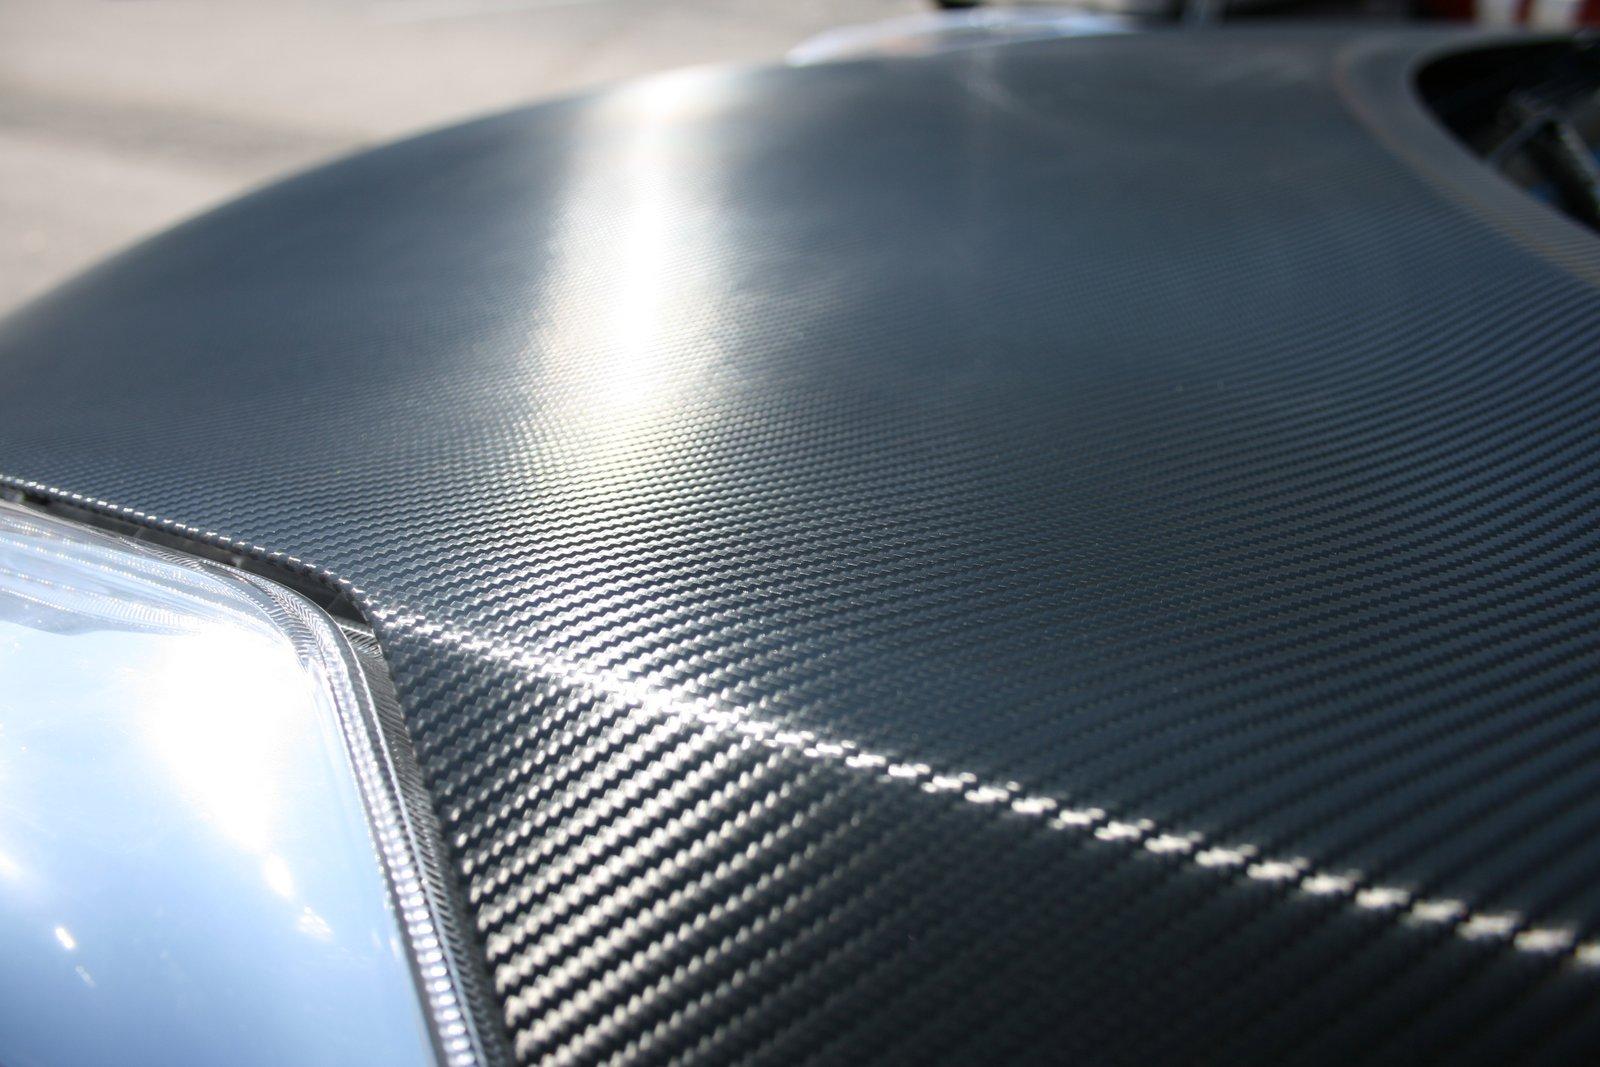 Nissan Juke 3m Carbon Fiber Vinyl Hood Amp Roof Wrap Carbon